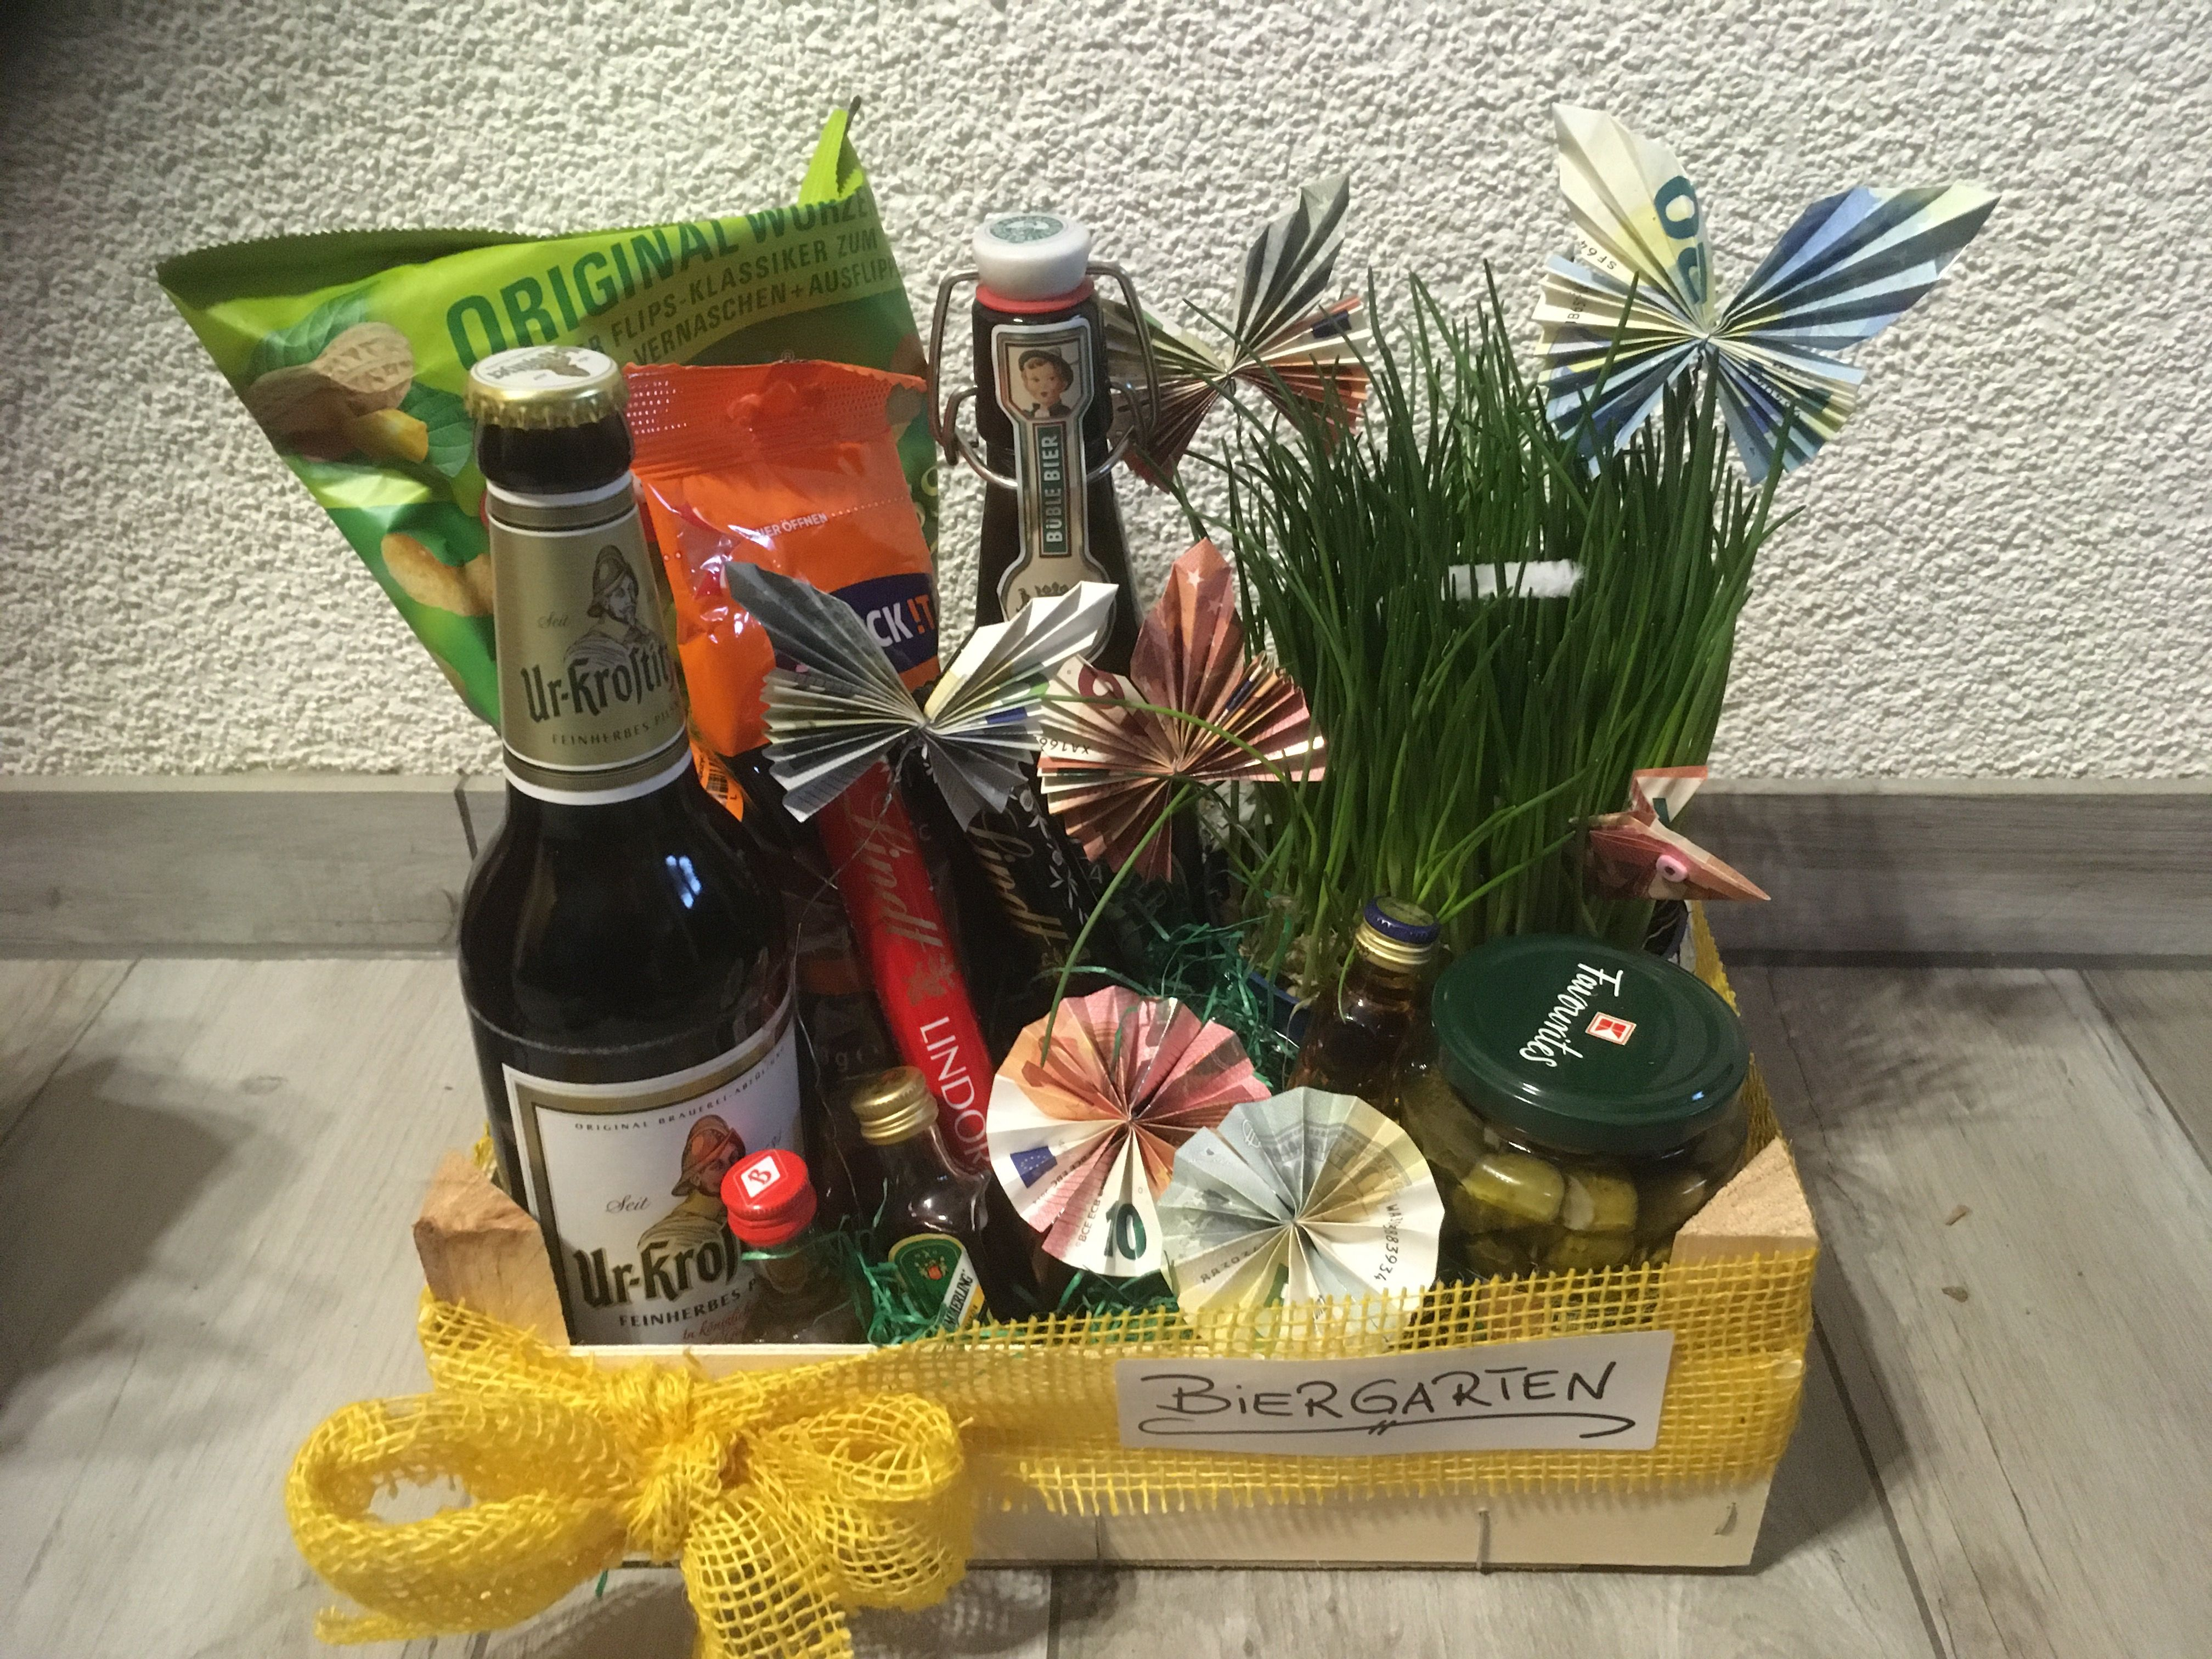 Biergarten Fur Den Mann In 2020 Geschenk Garten Geschenke Geschenke Zum 50